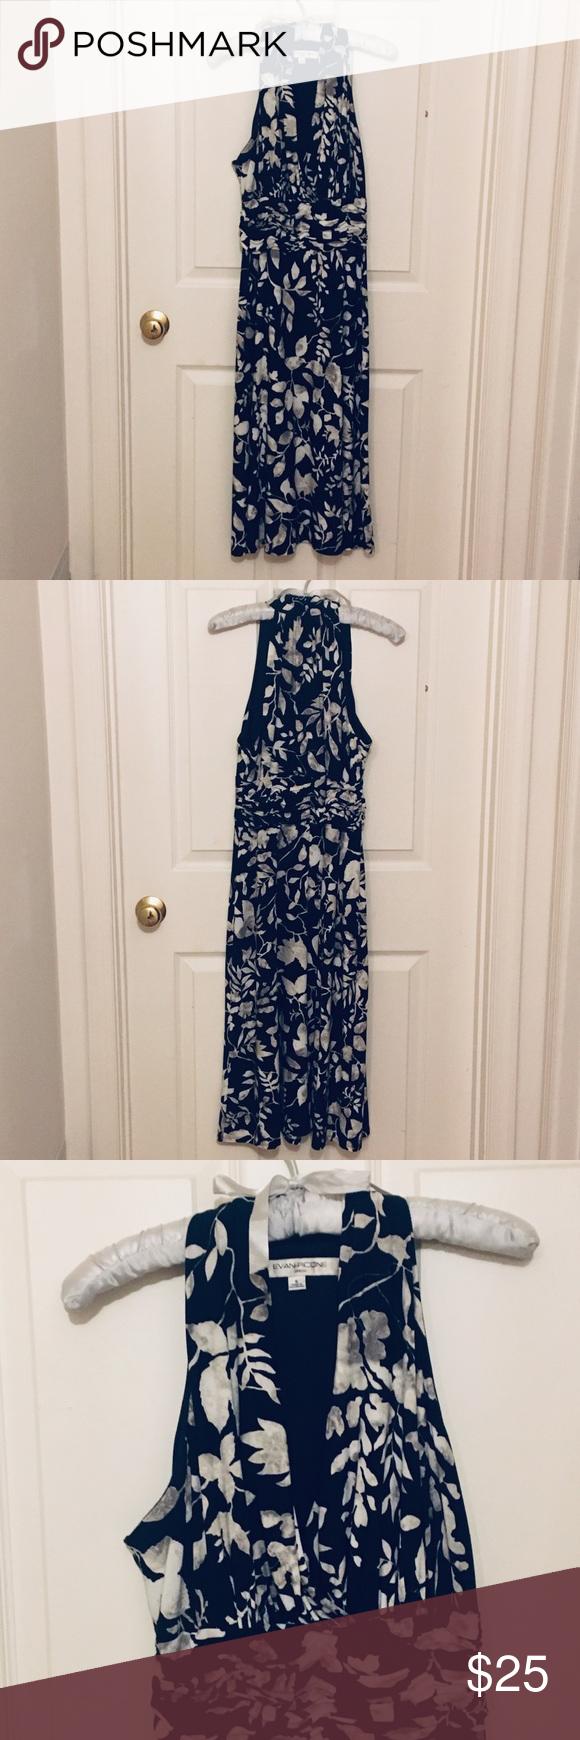 Evan picone black and white dress in my posh picks